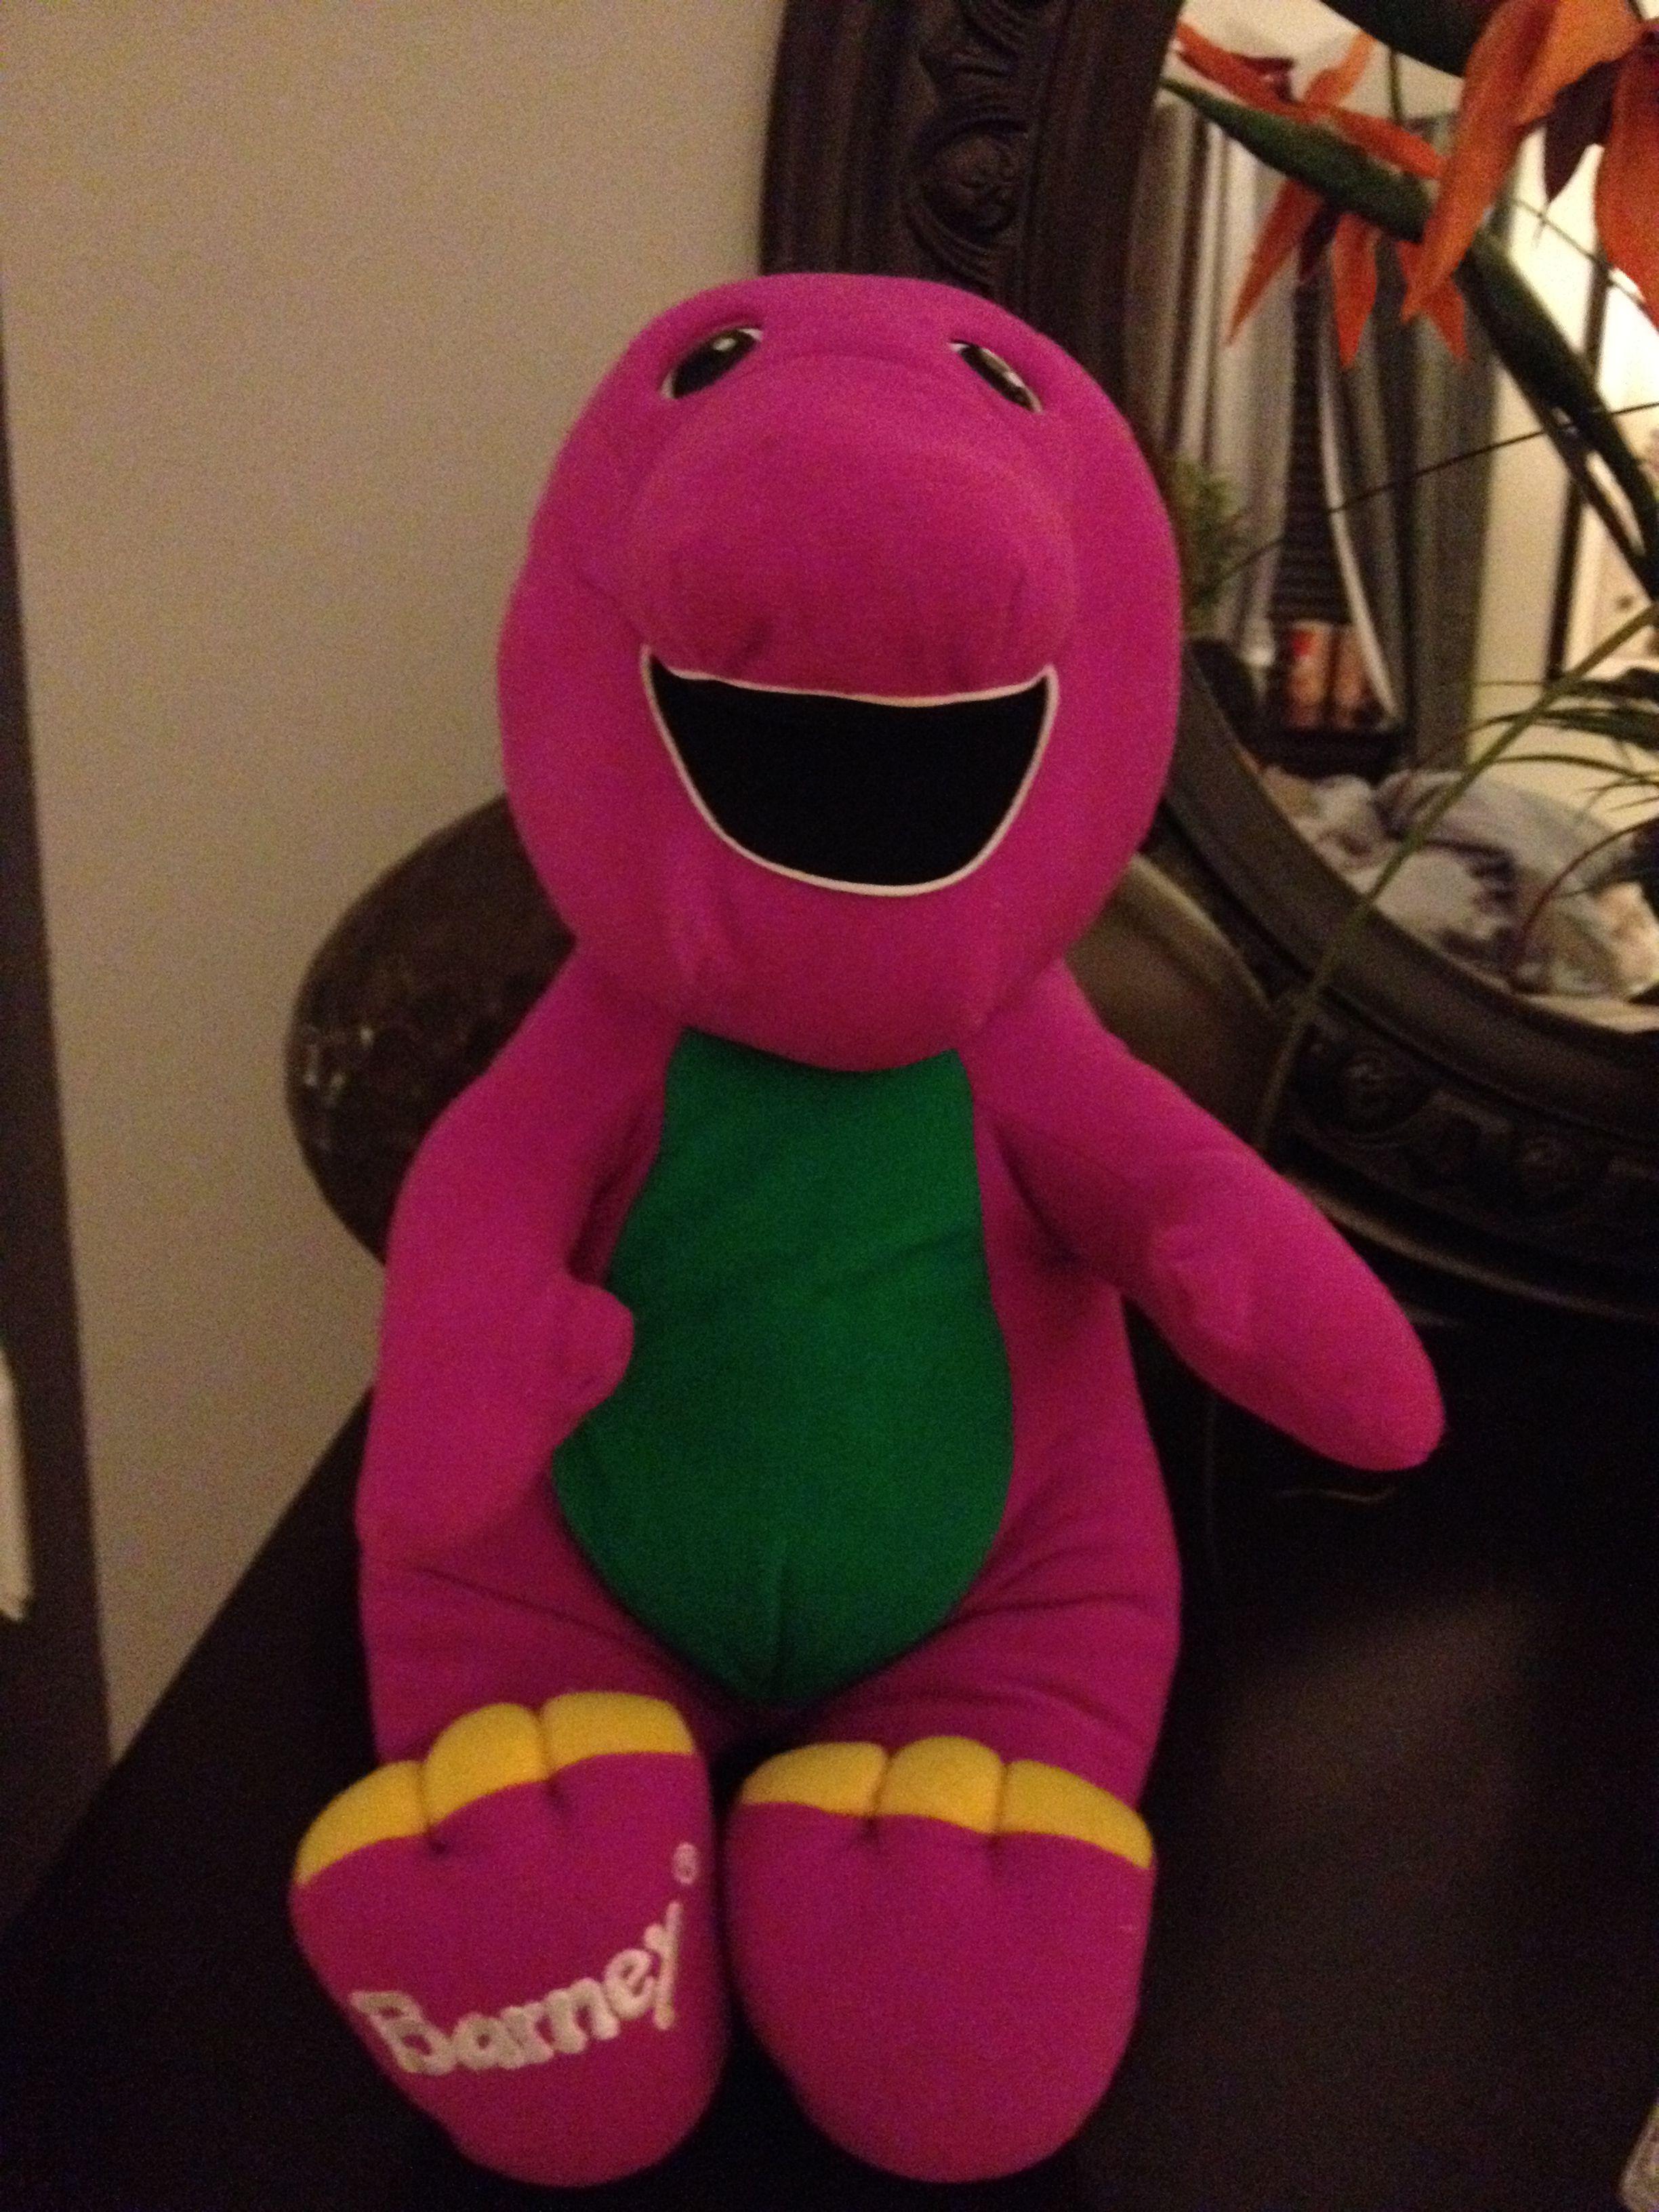 playskool talking barney the dinosaur 17